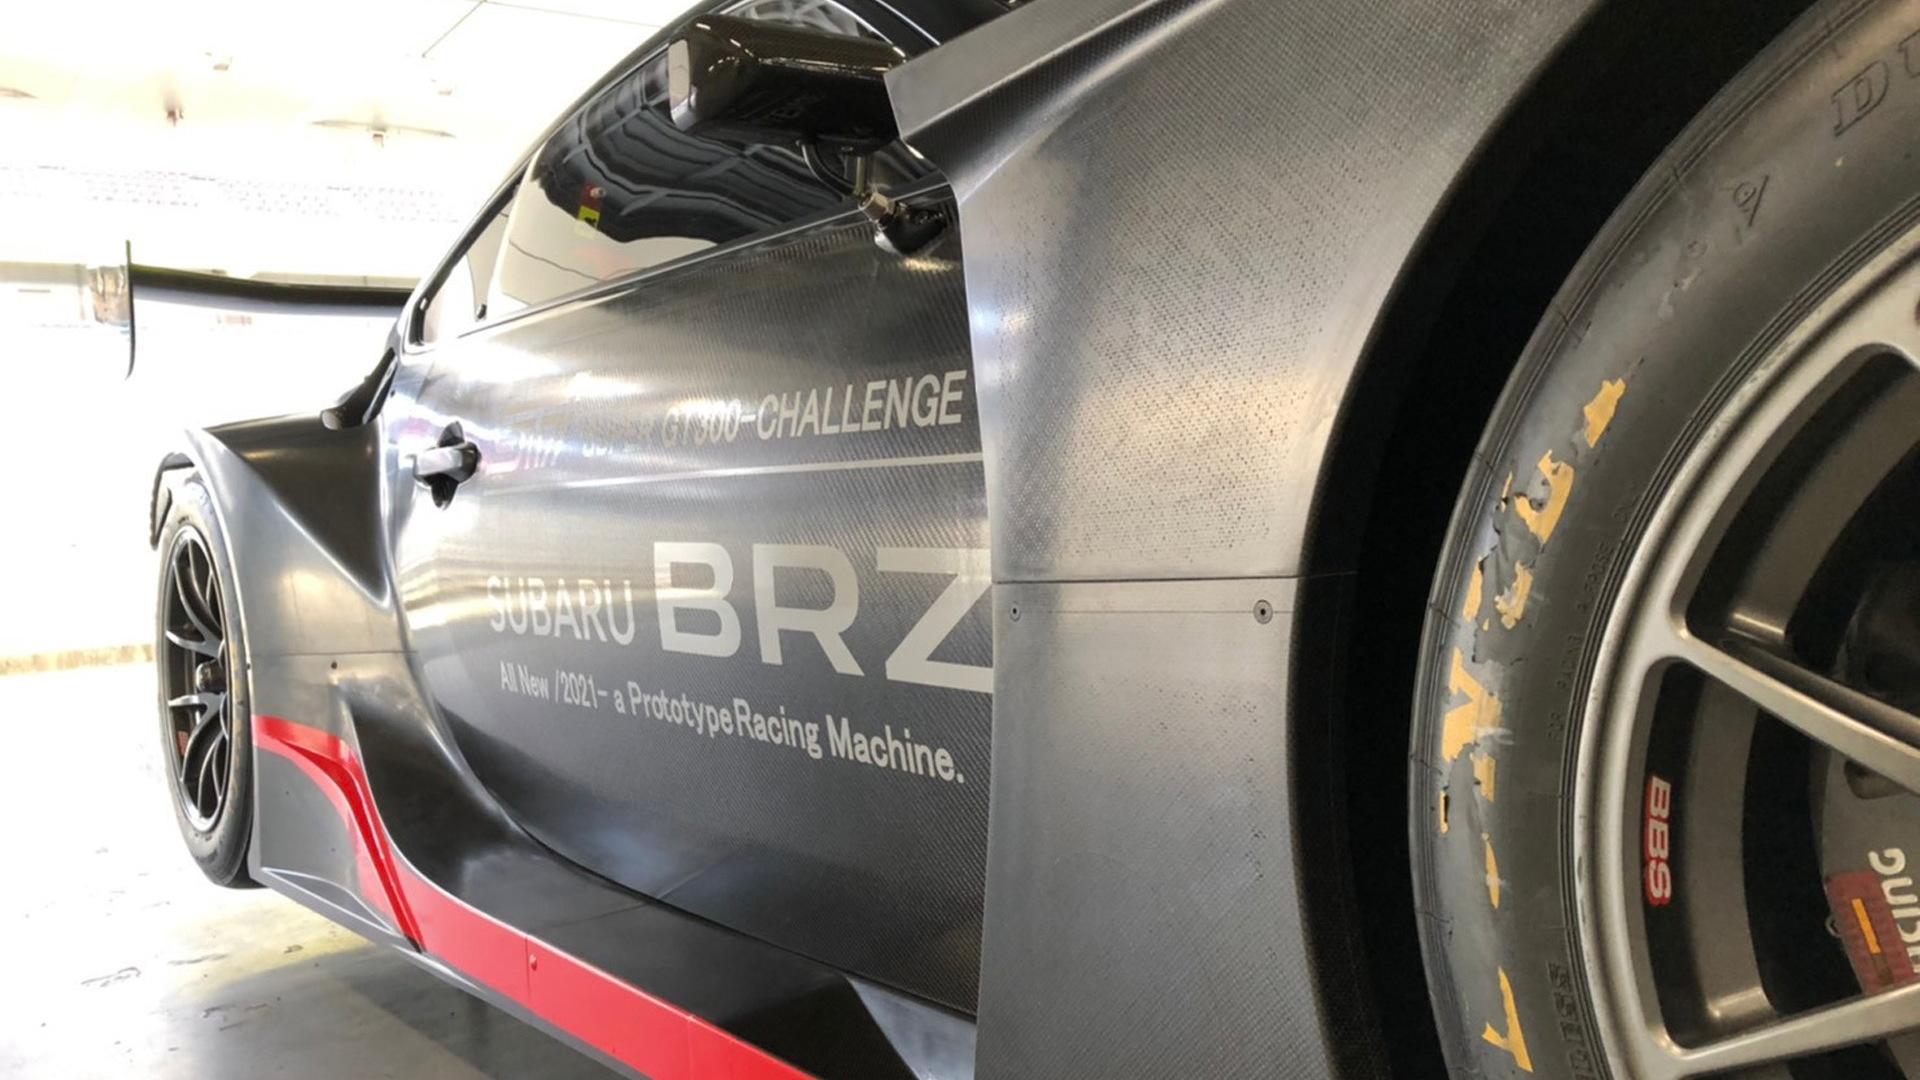 2021 Subaru BRZ GT300 race car